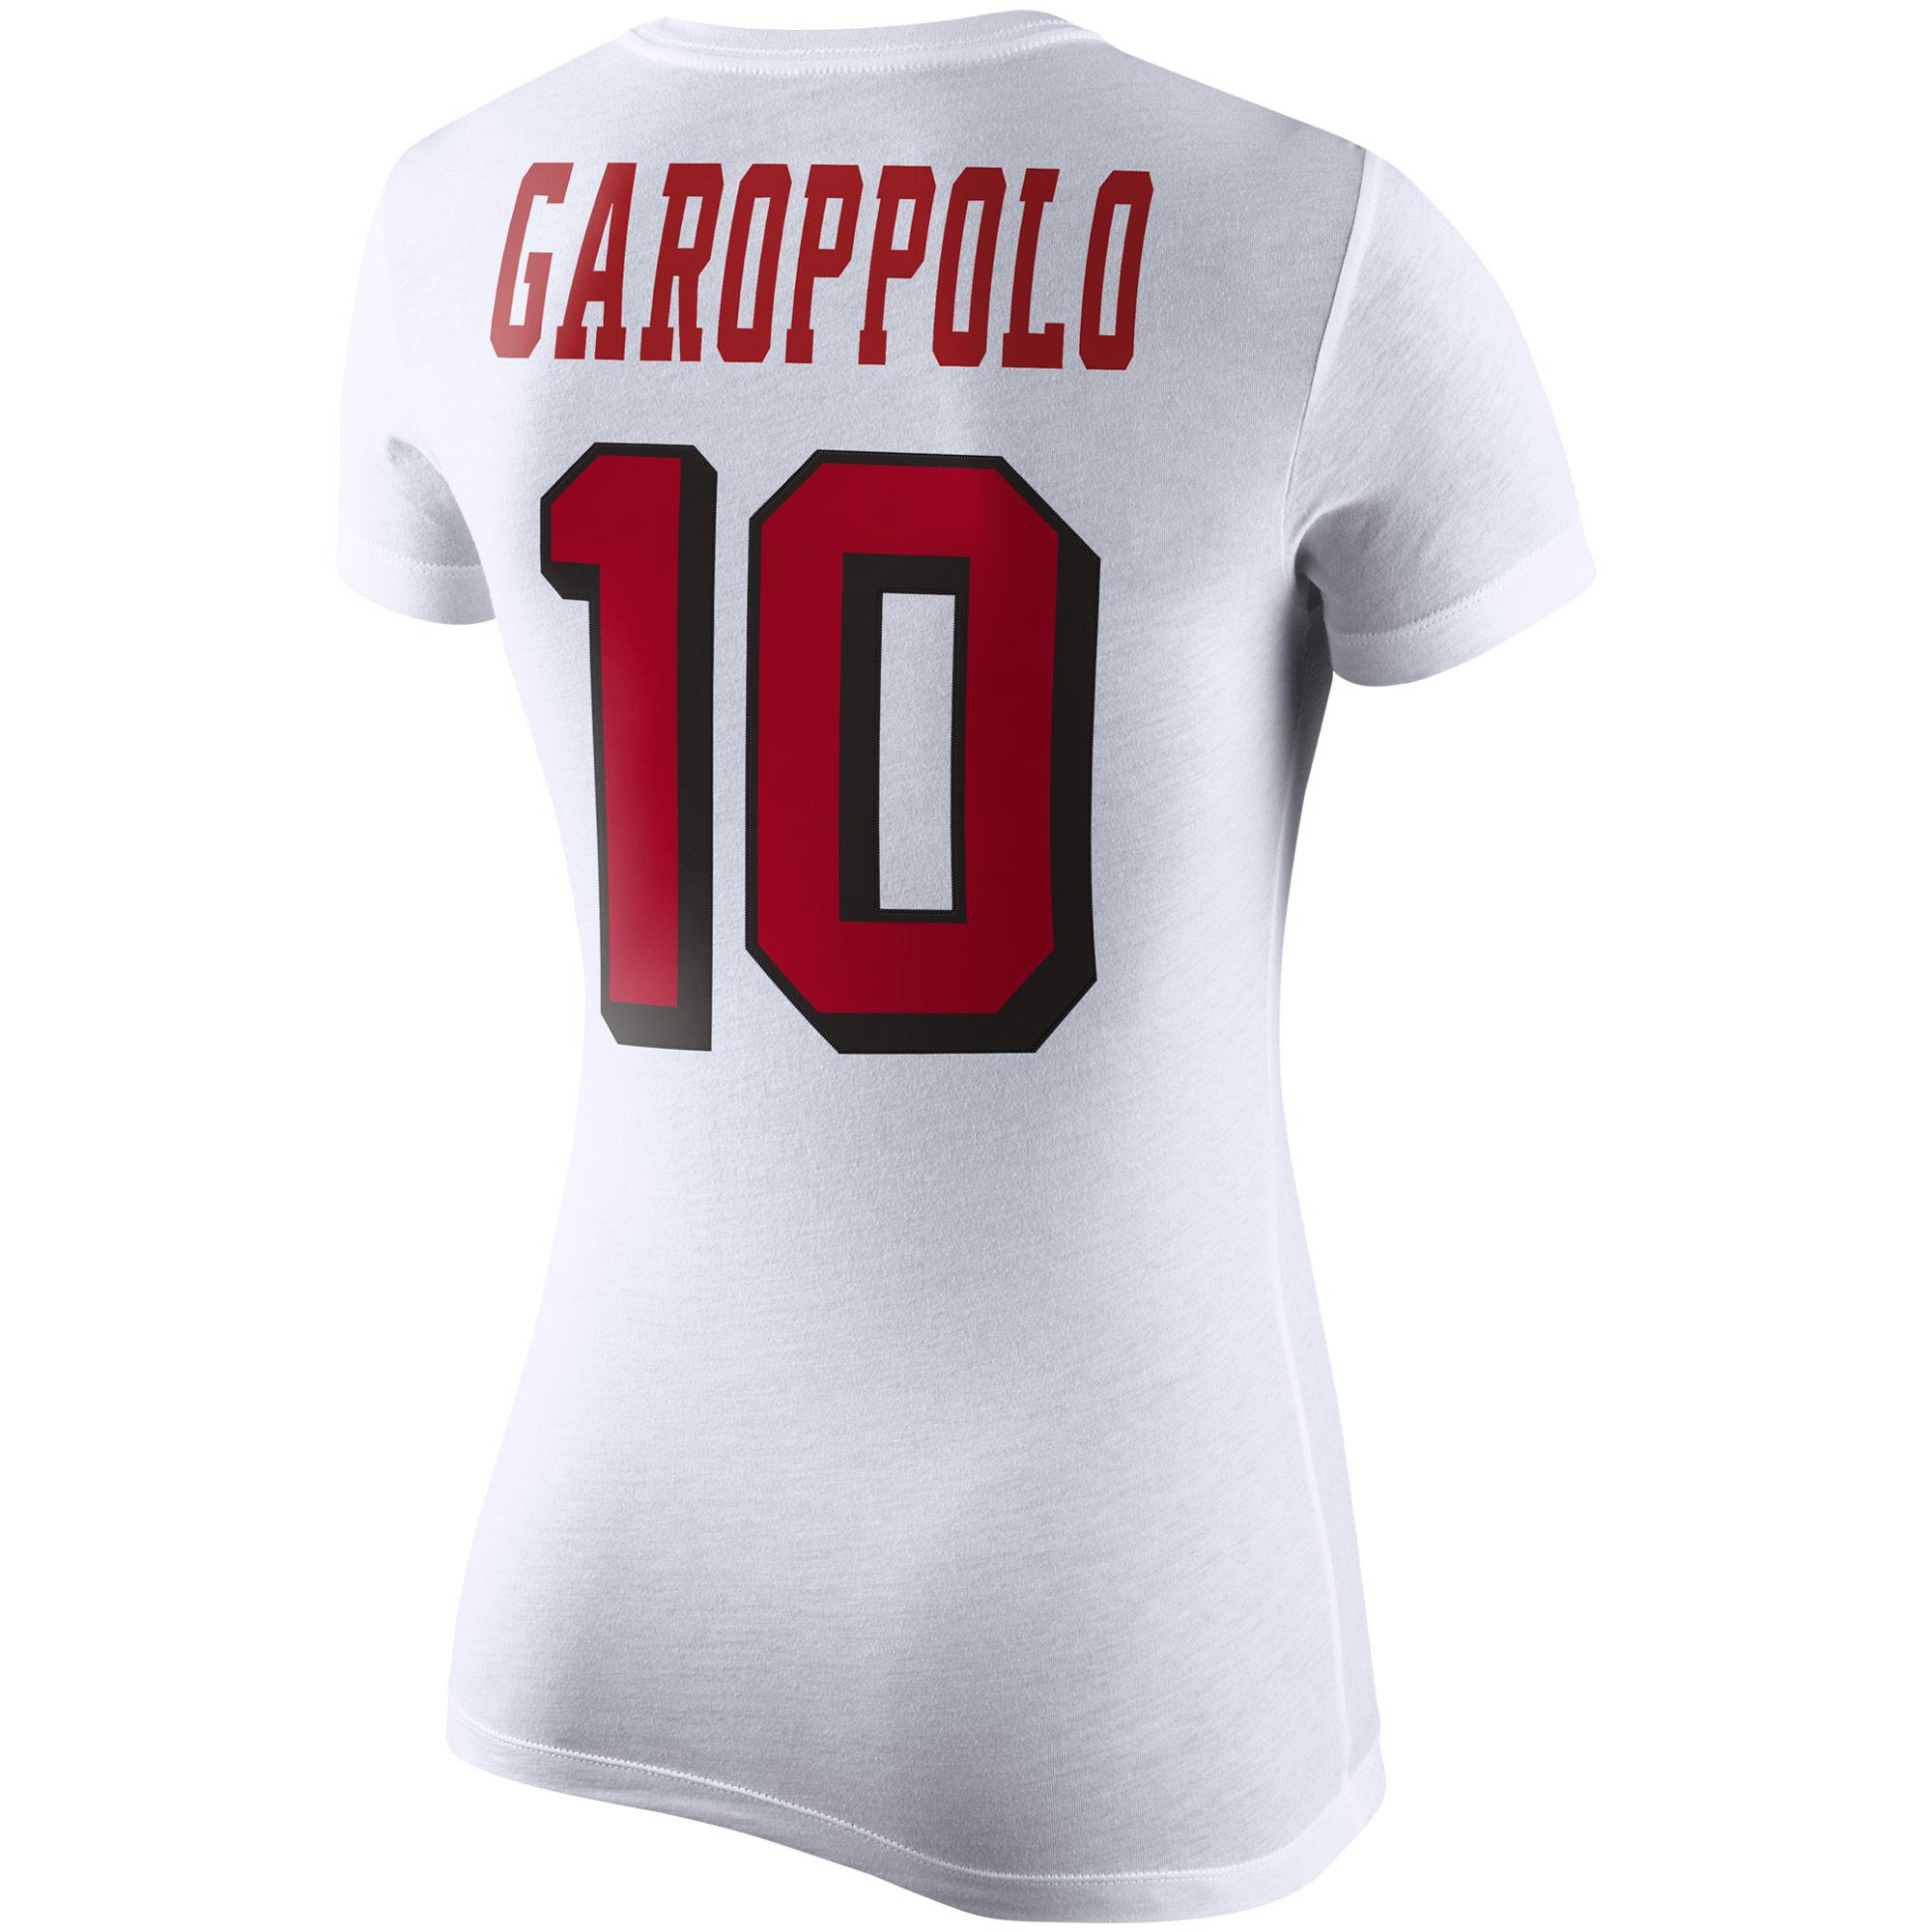 a9d008eb3 Jimmy Garoppolo San Francisco 49ers Nike Women s Team Player Pride Name   Number  Performance T-Shirt - White - Walmart.com